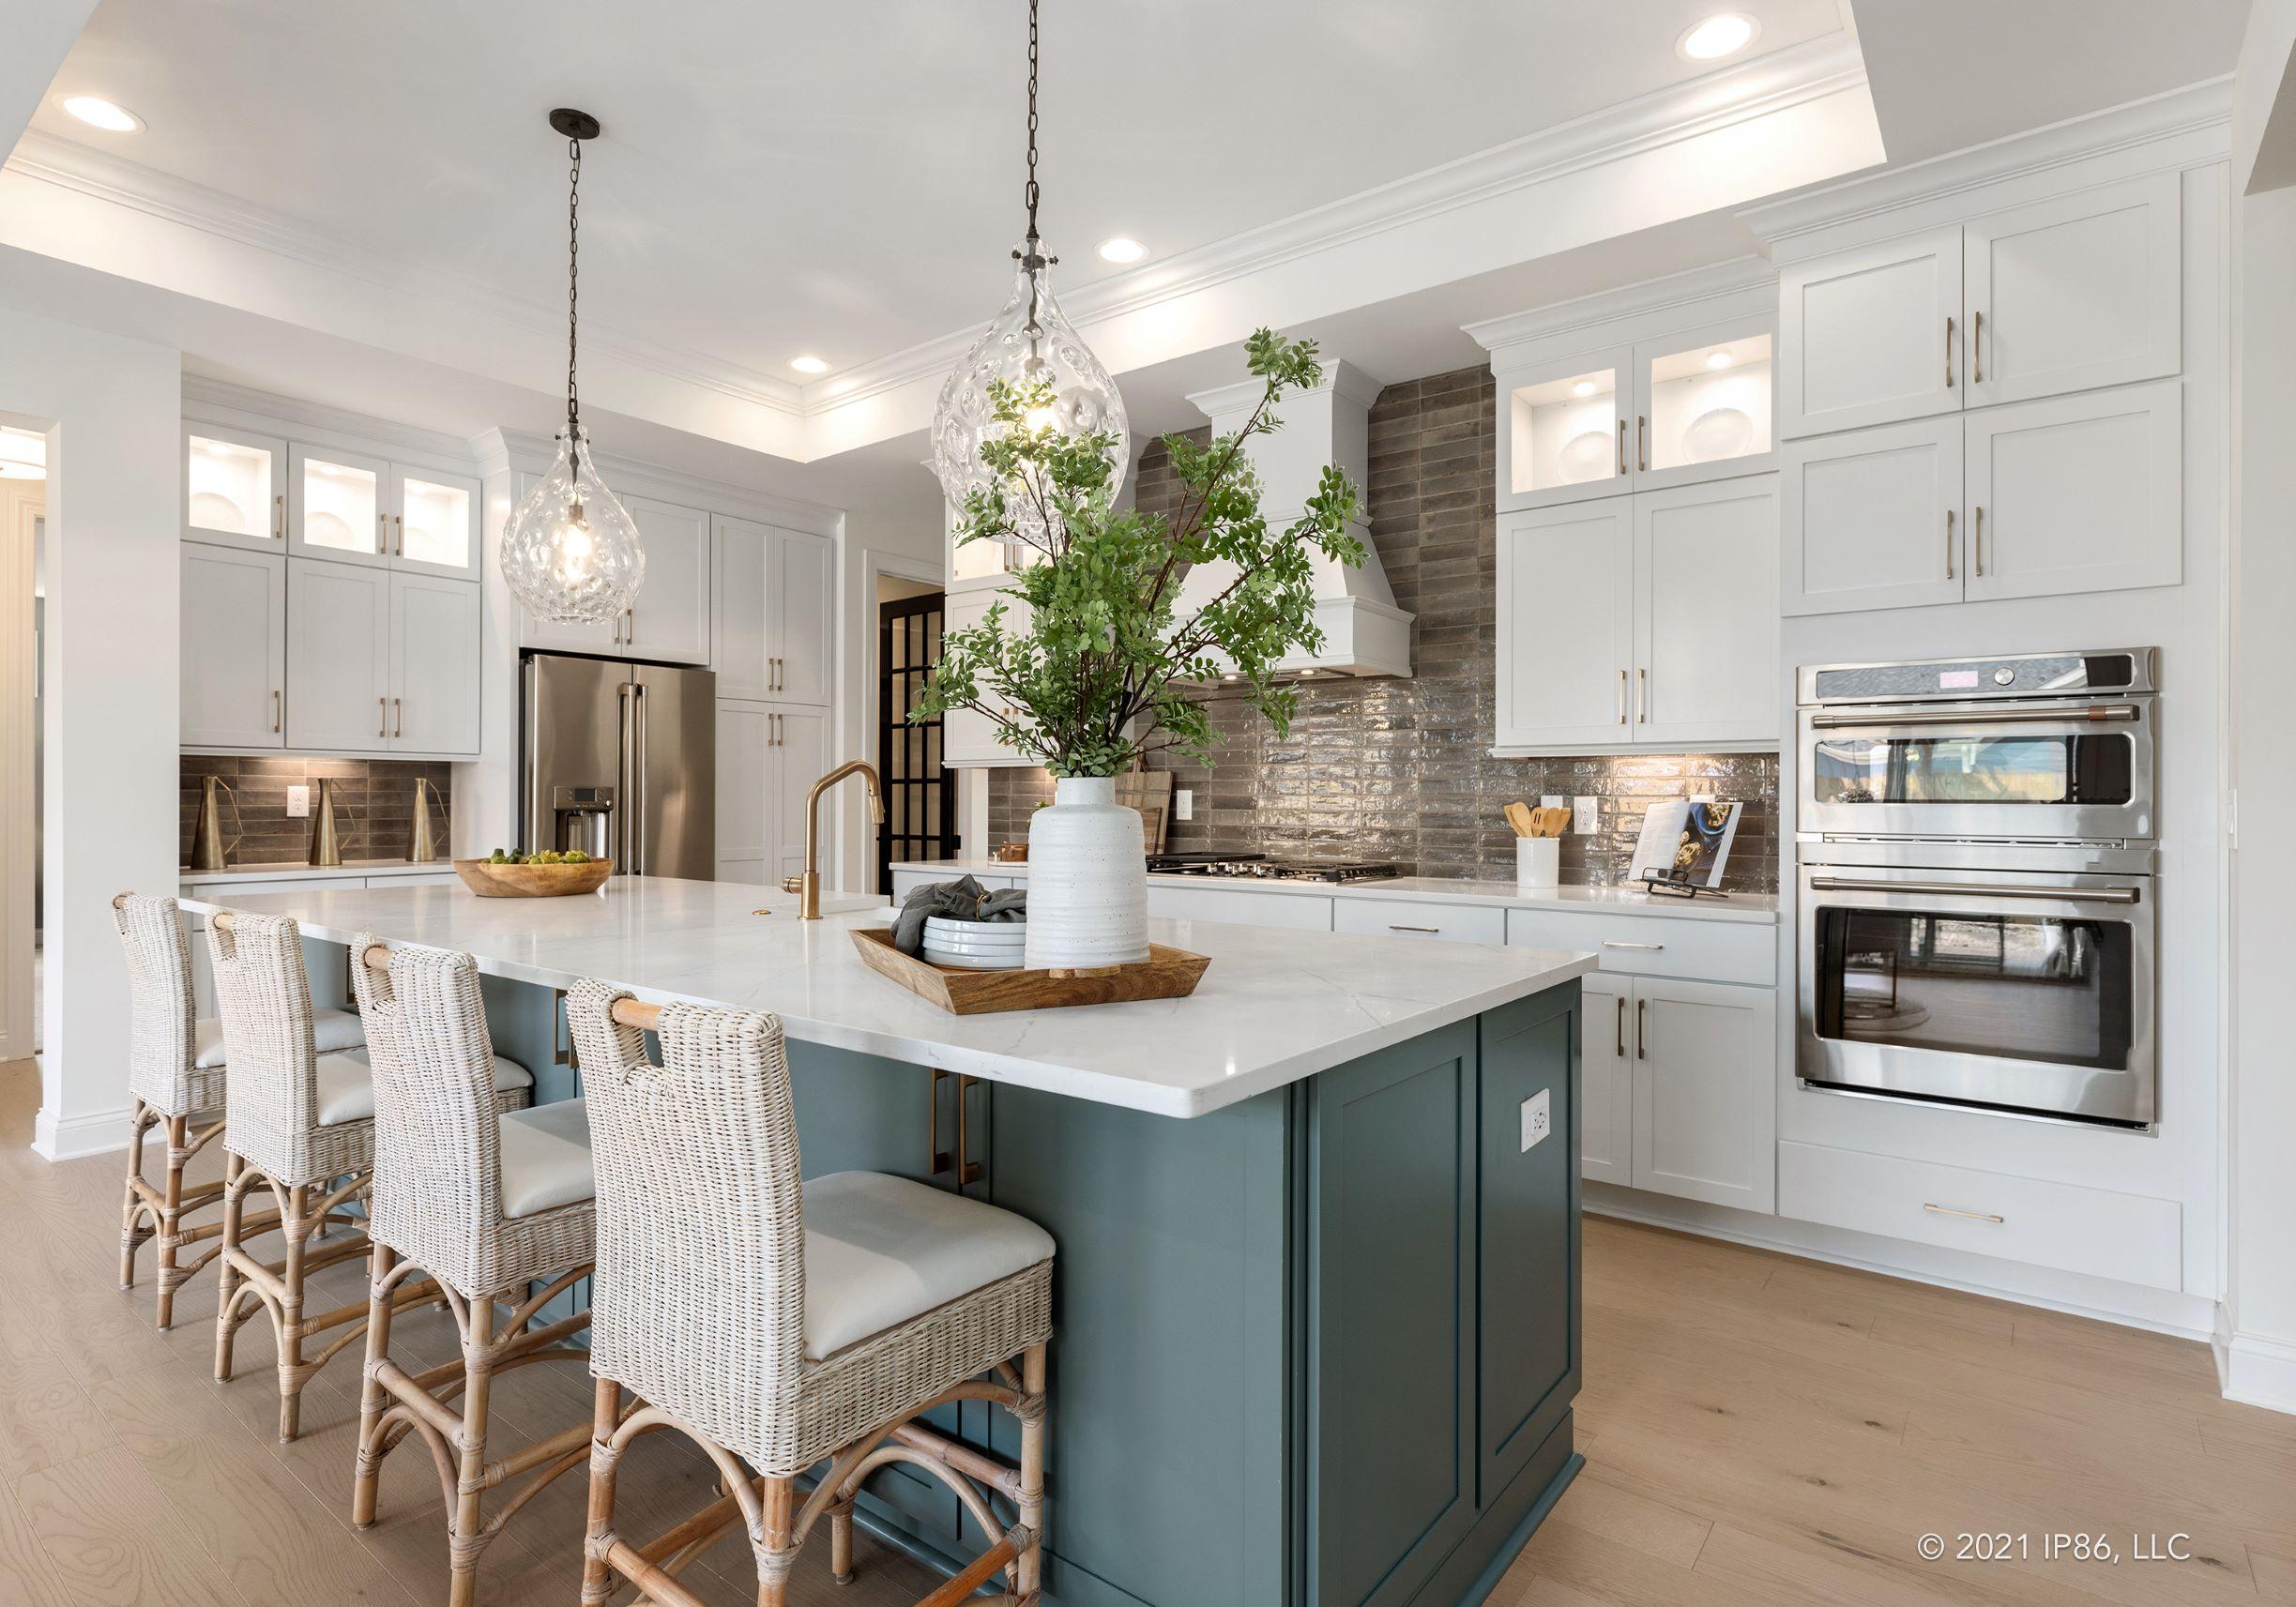 Open floor plan bright kitchen promotes dreams of a joyful lifestyle.